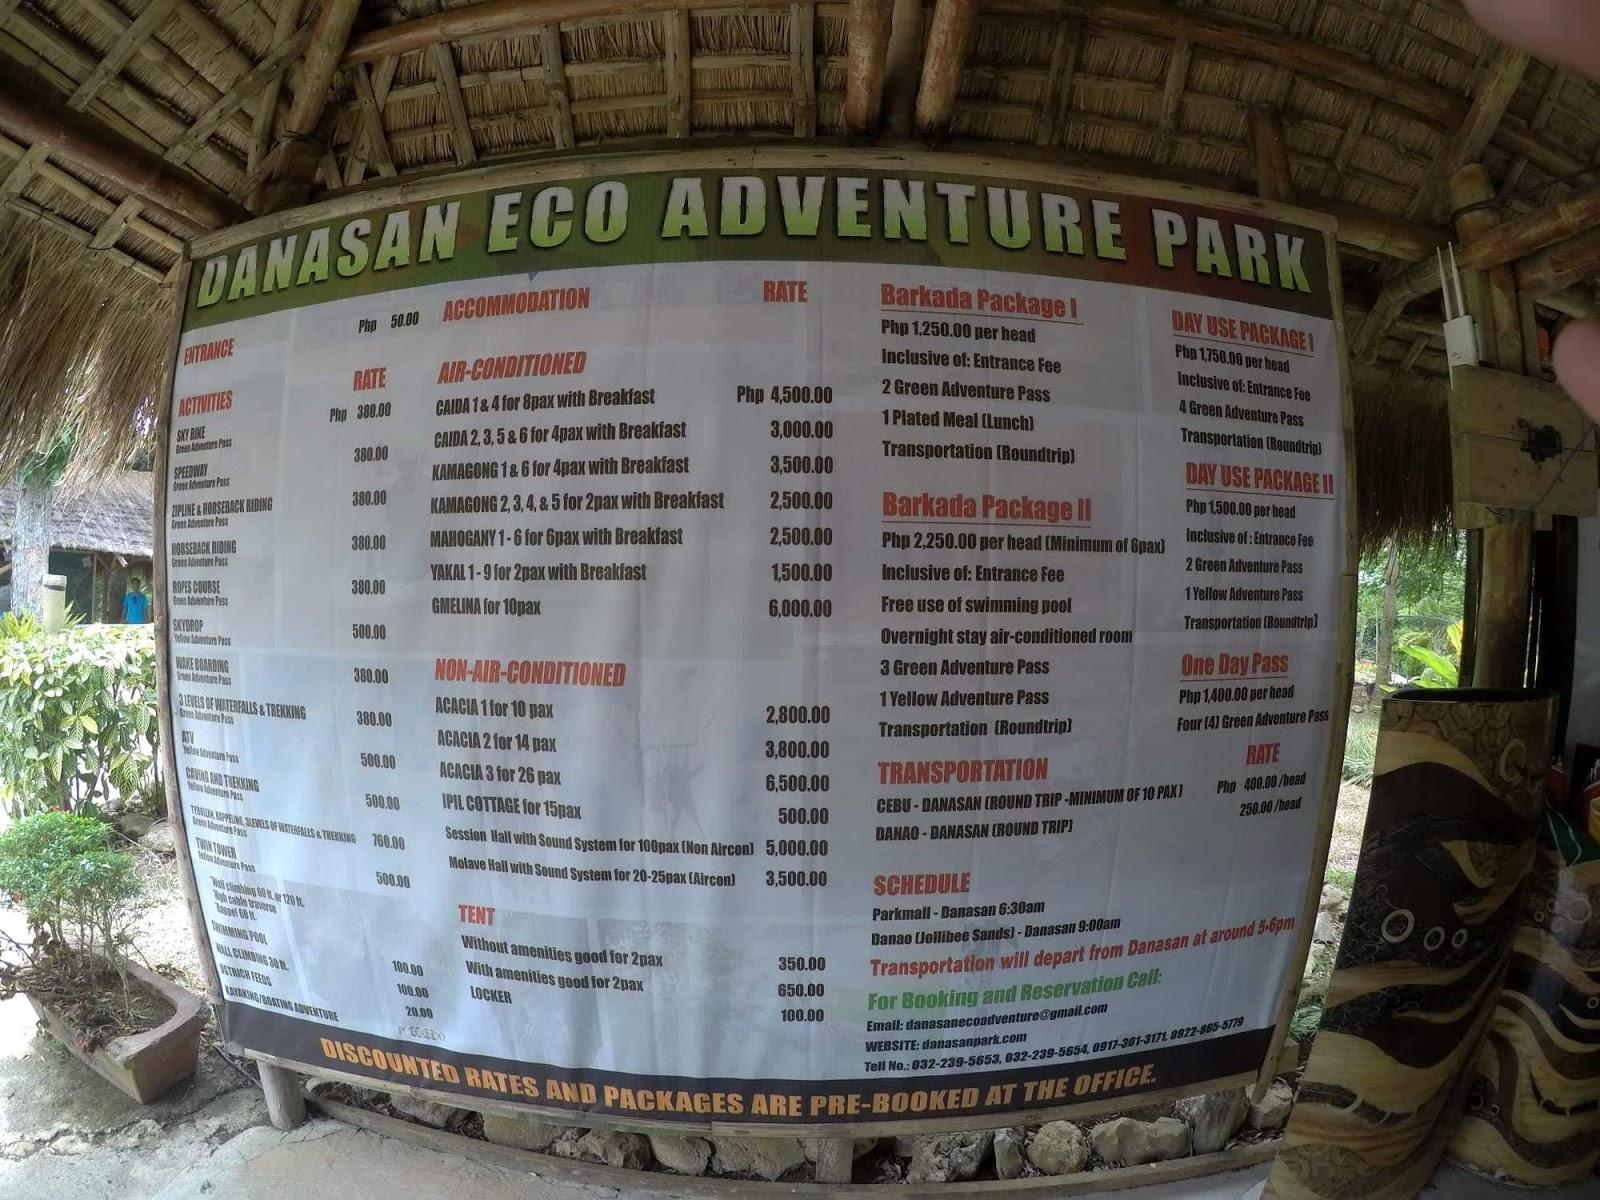 Blithe Danasan Eco Adventure Park Rates